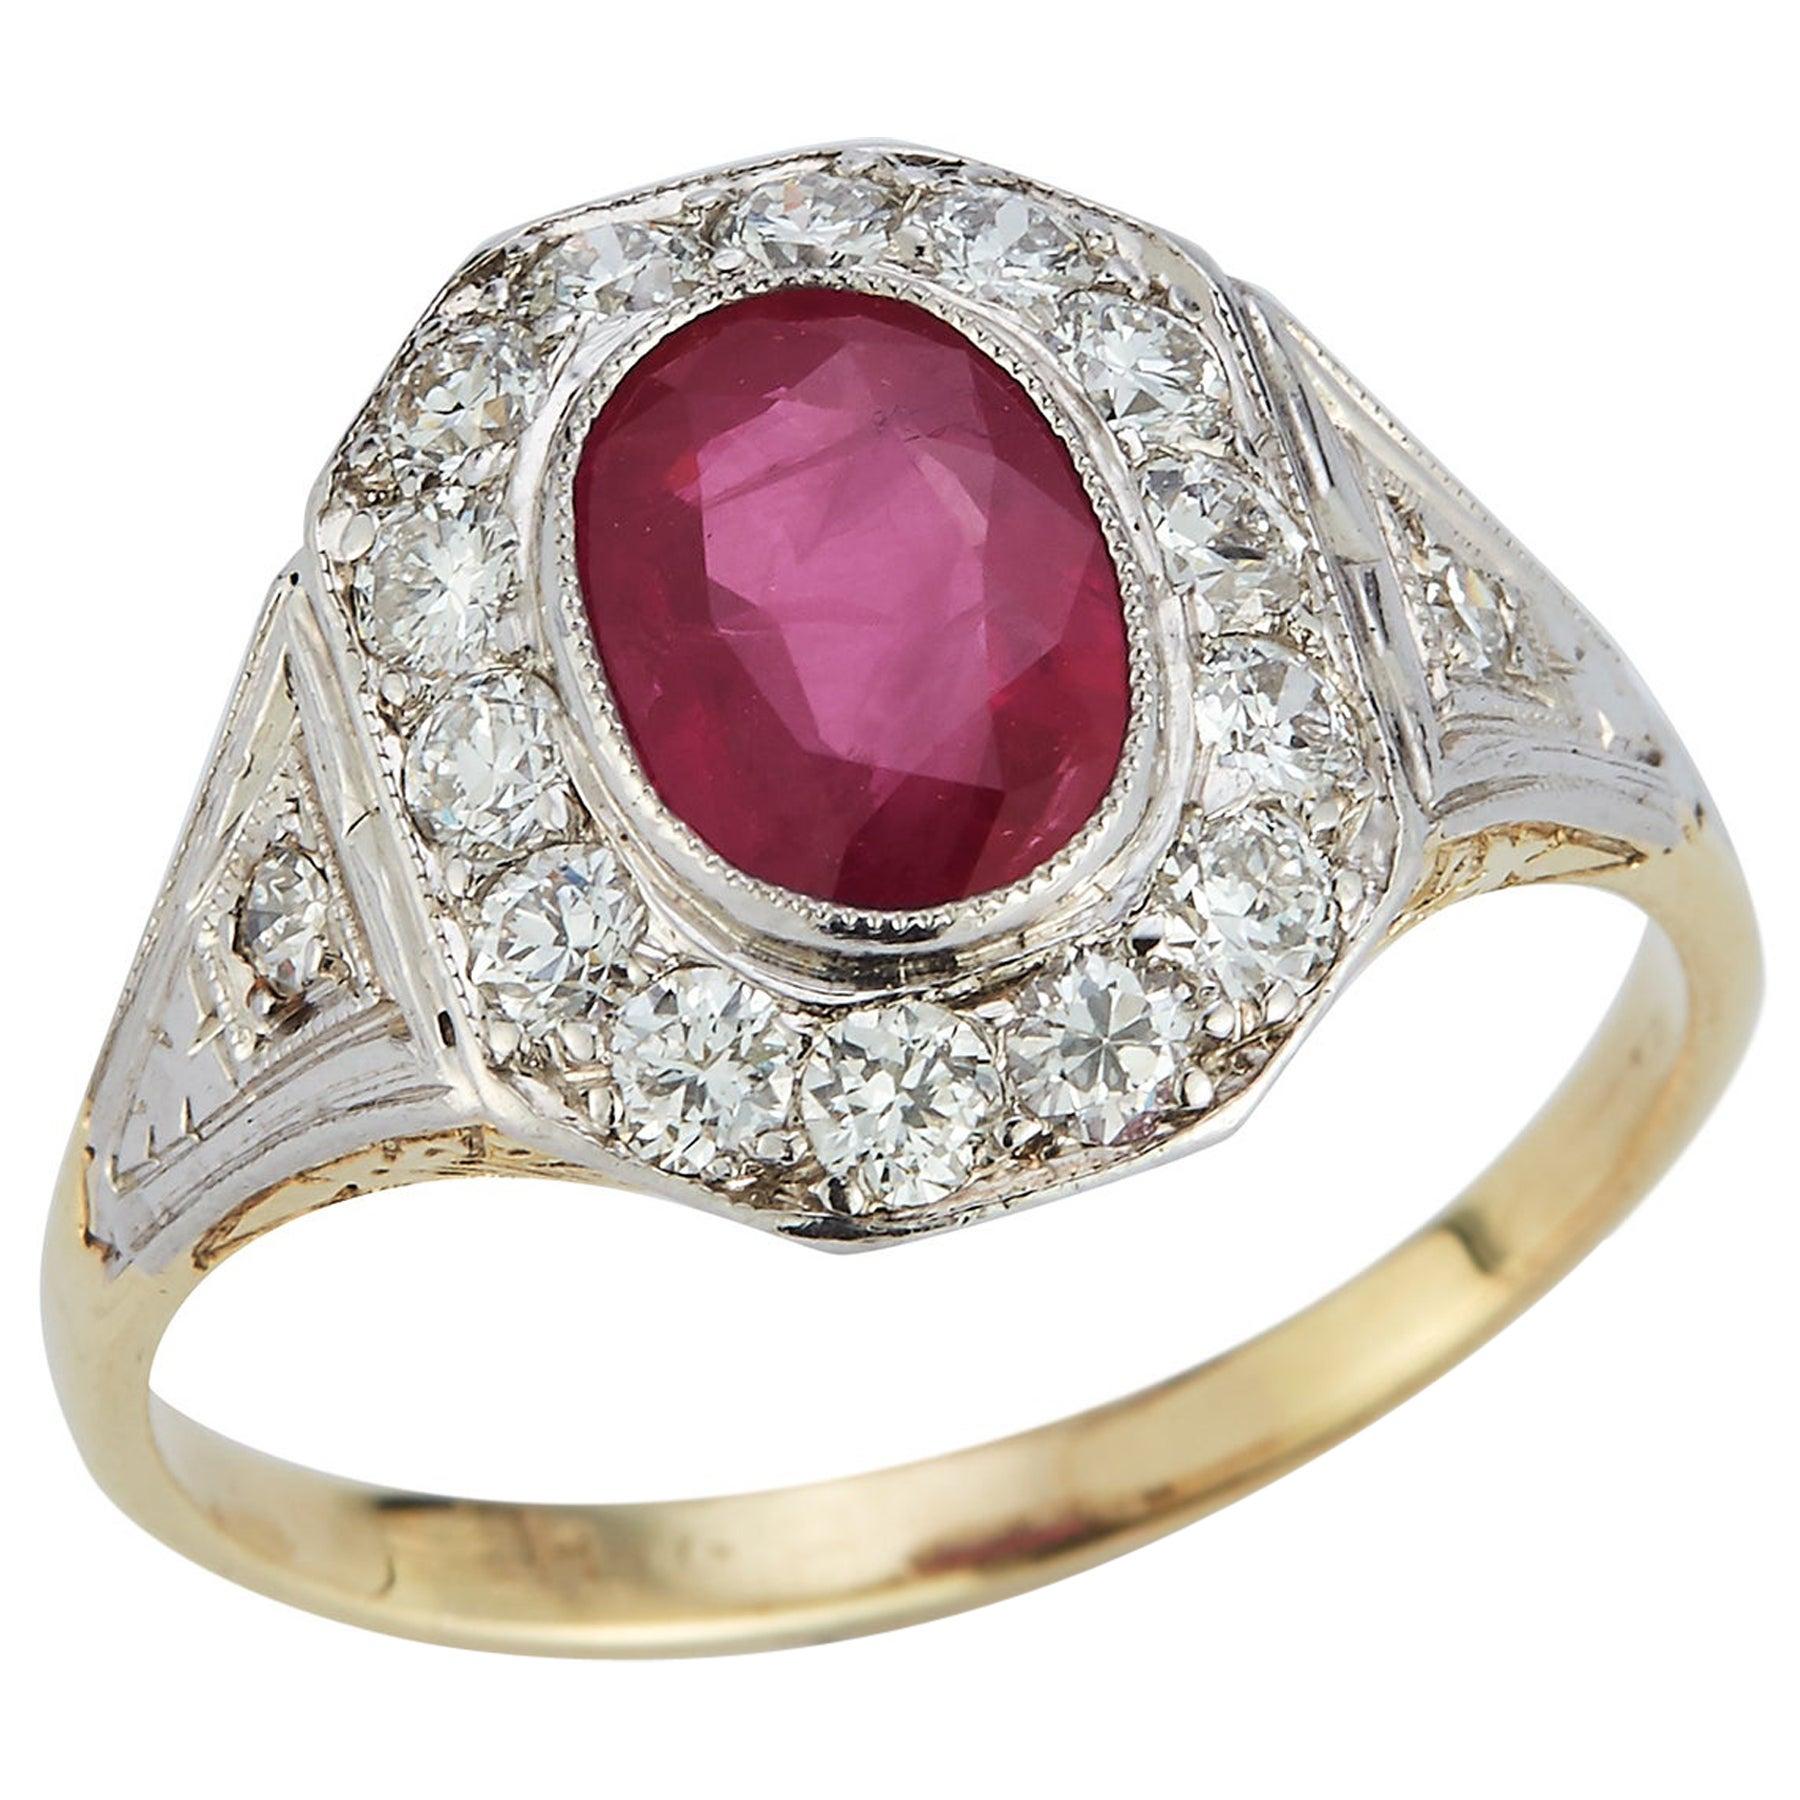 Certified Ruby & Diamond Ring